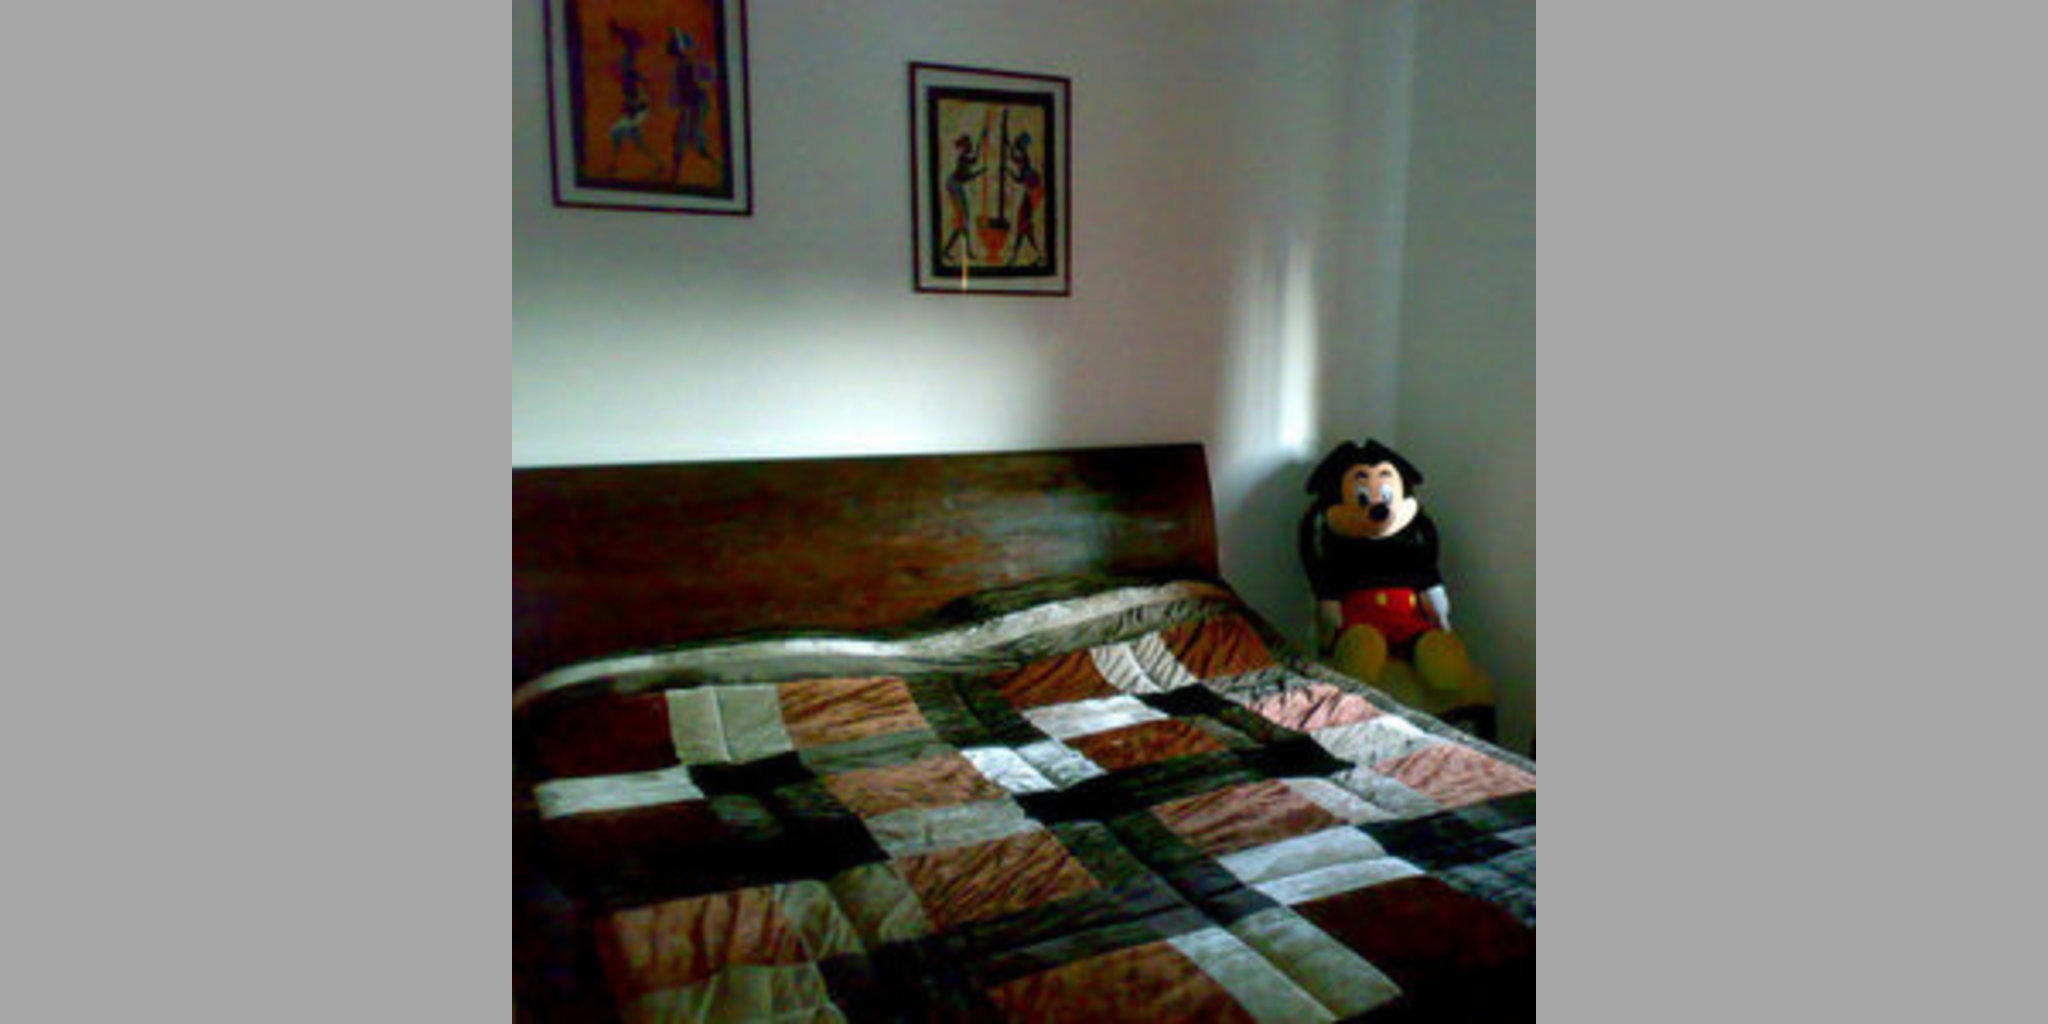 Bed & Breakfast Villafranca Di Verona - Villafranca Di Verona_A